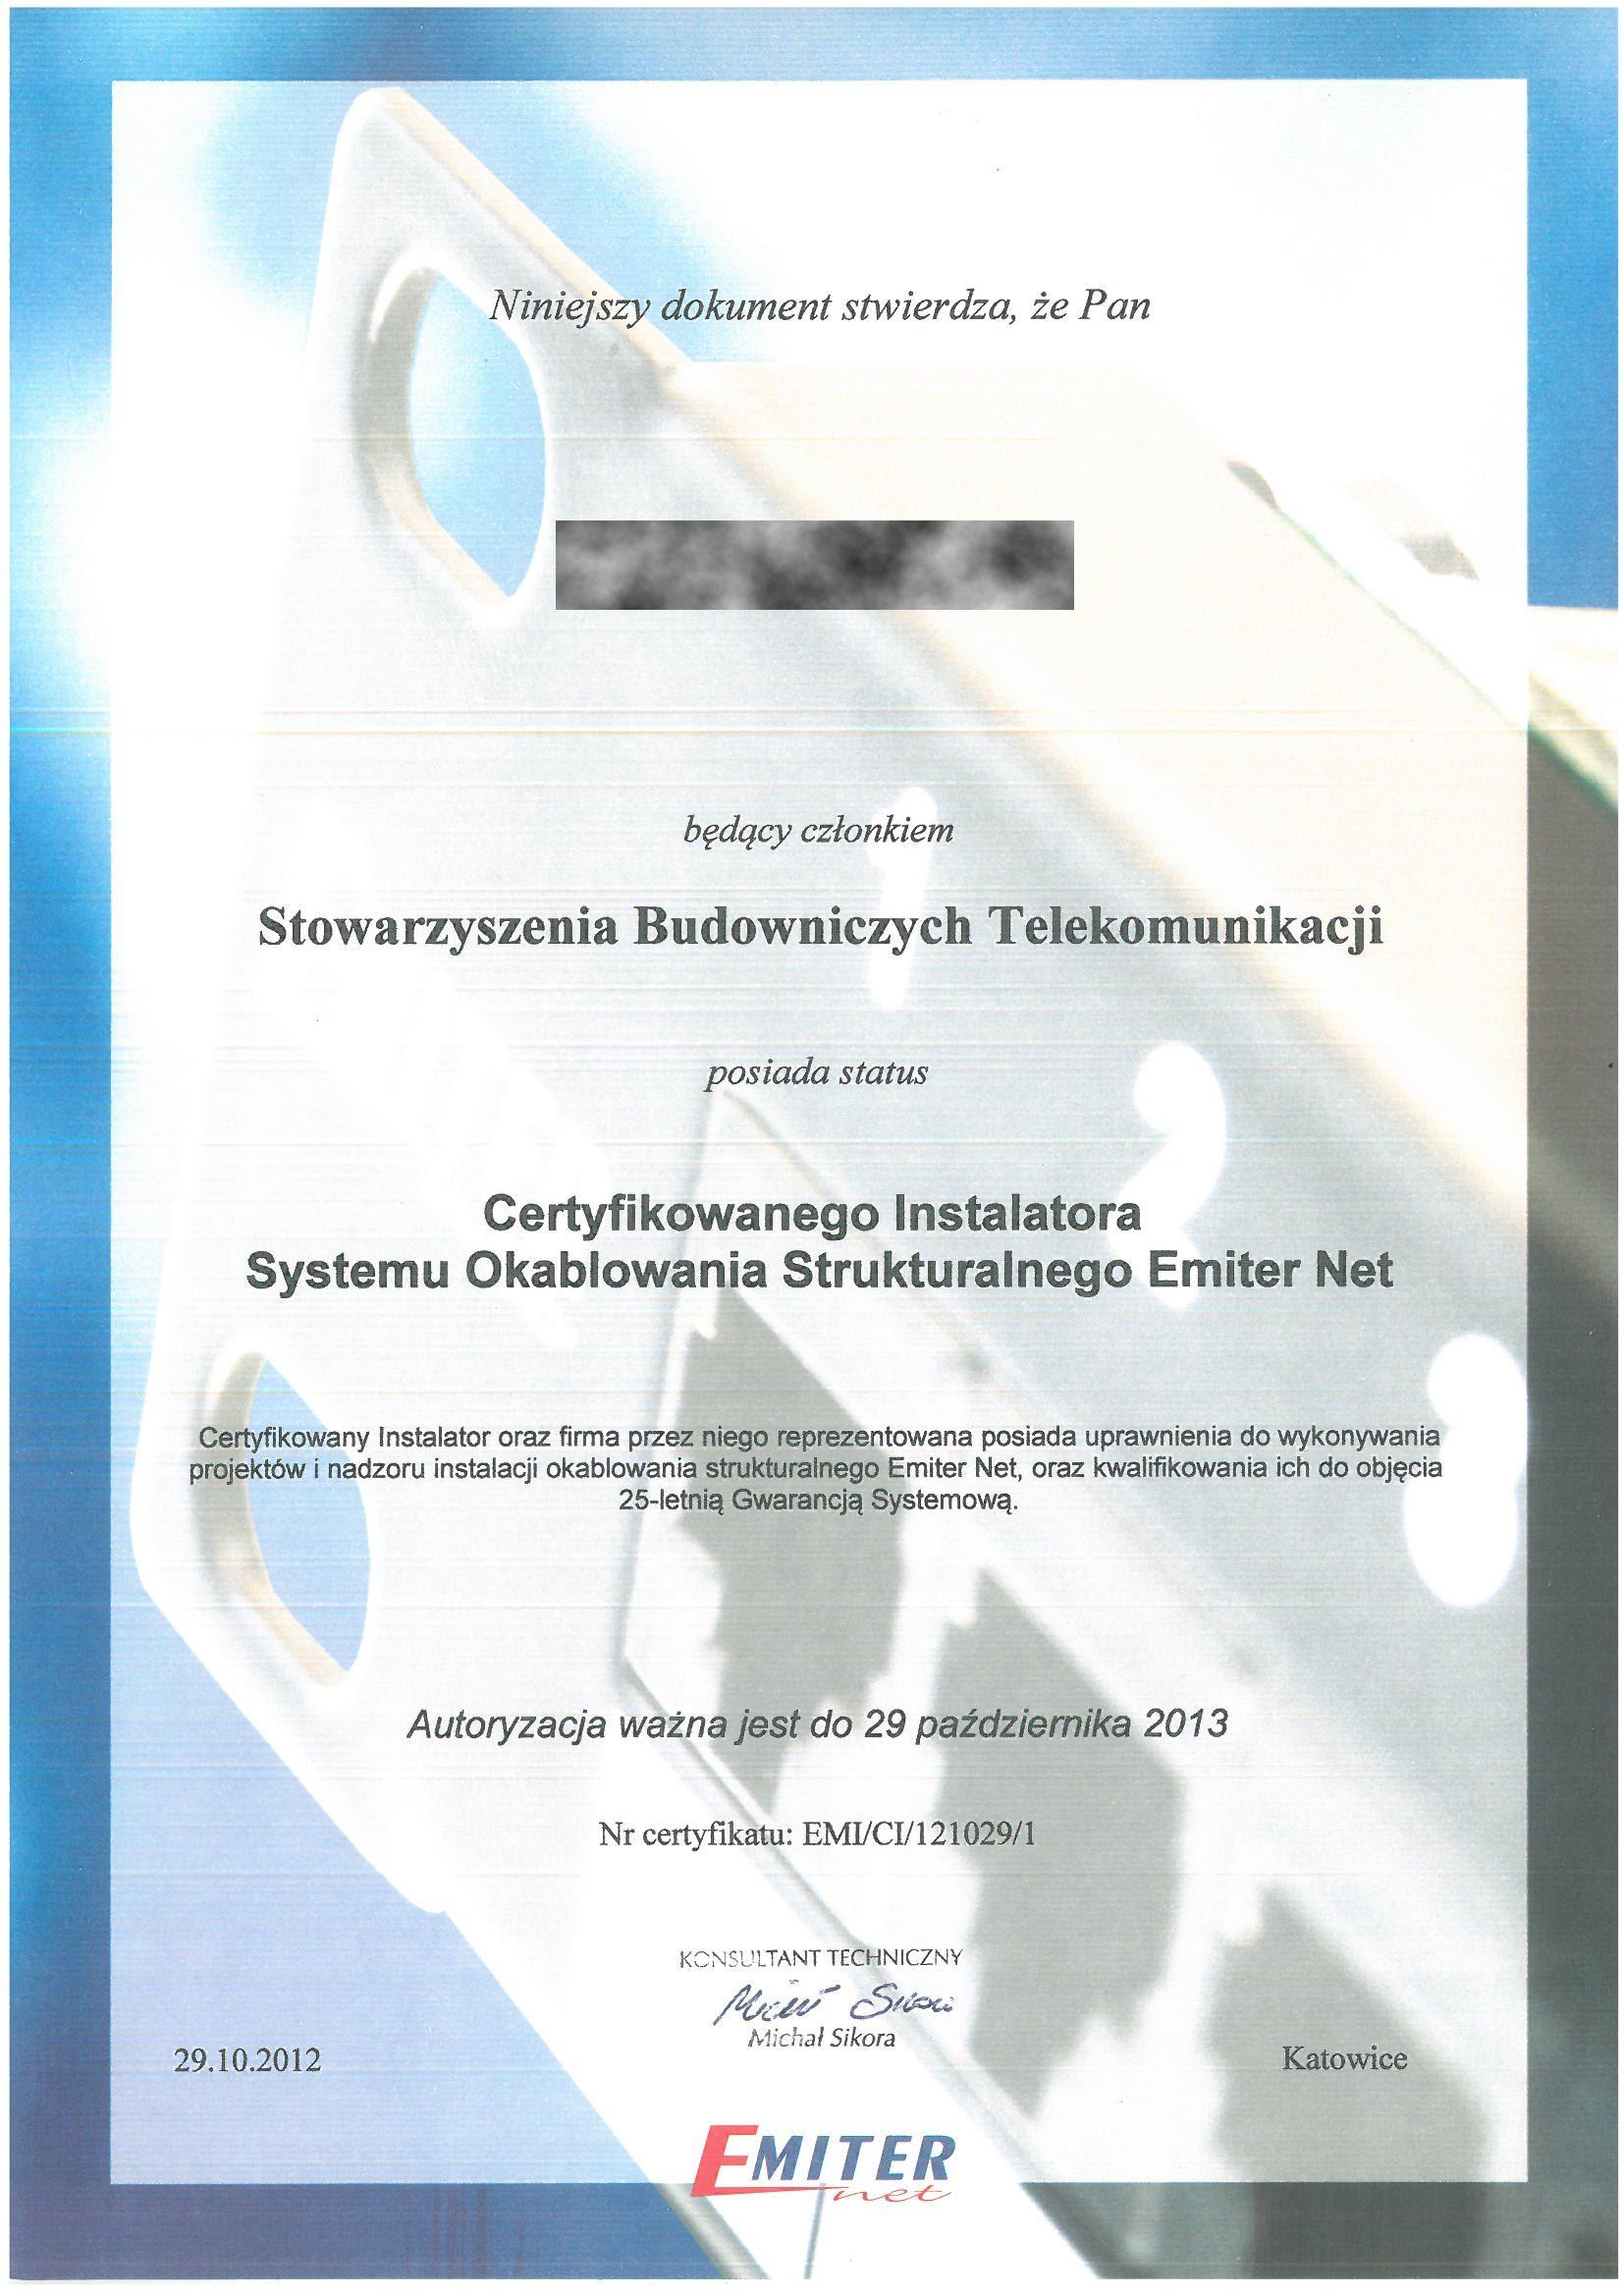 EMITER 2012 TB Instalator Systemu Okablowania RODO